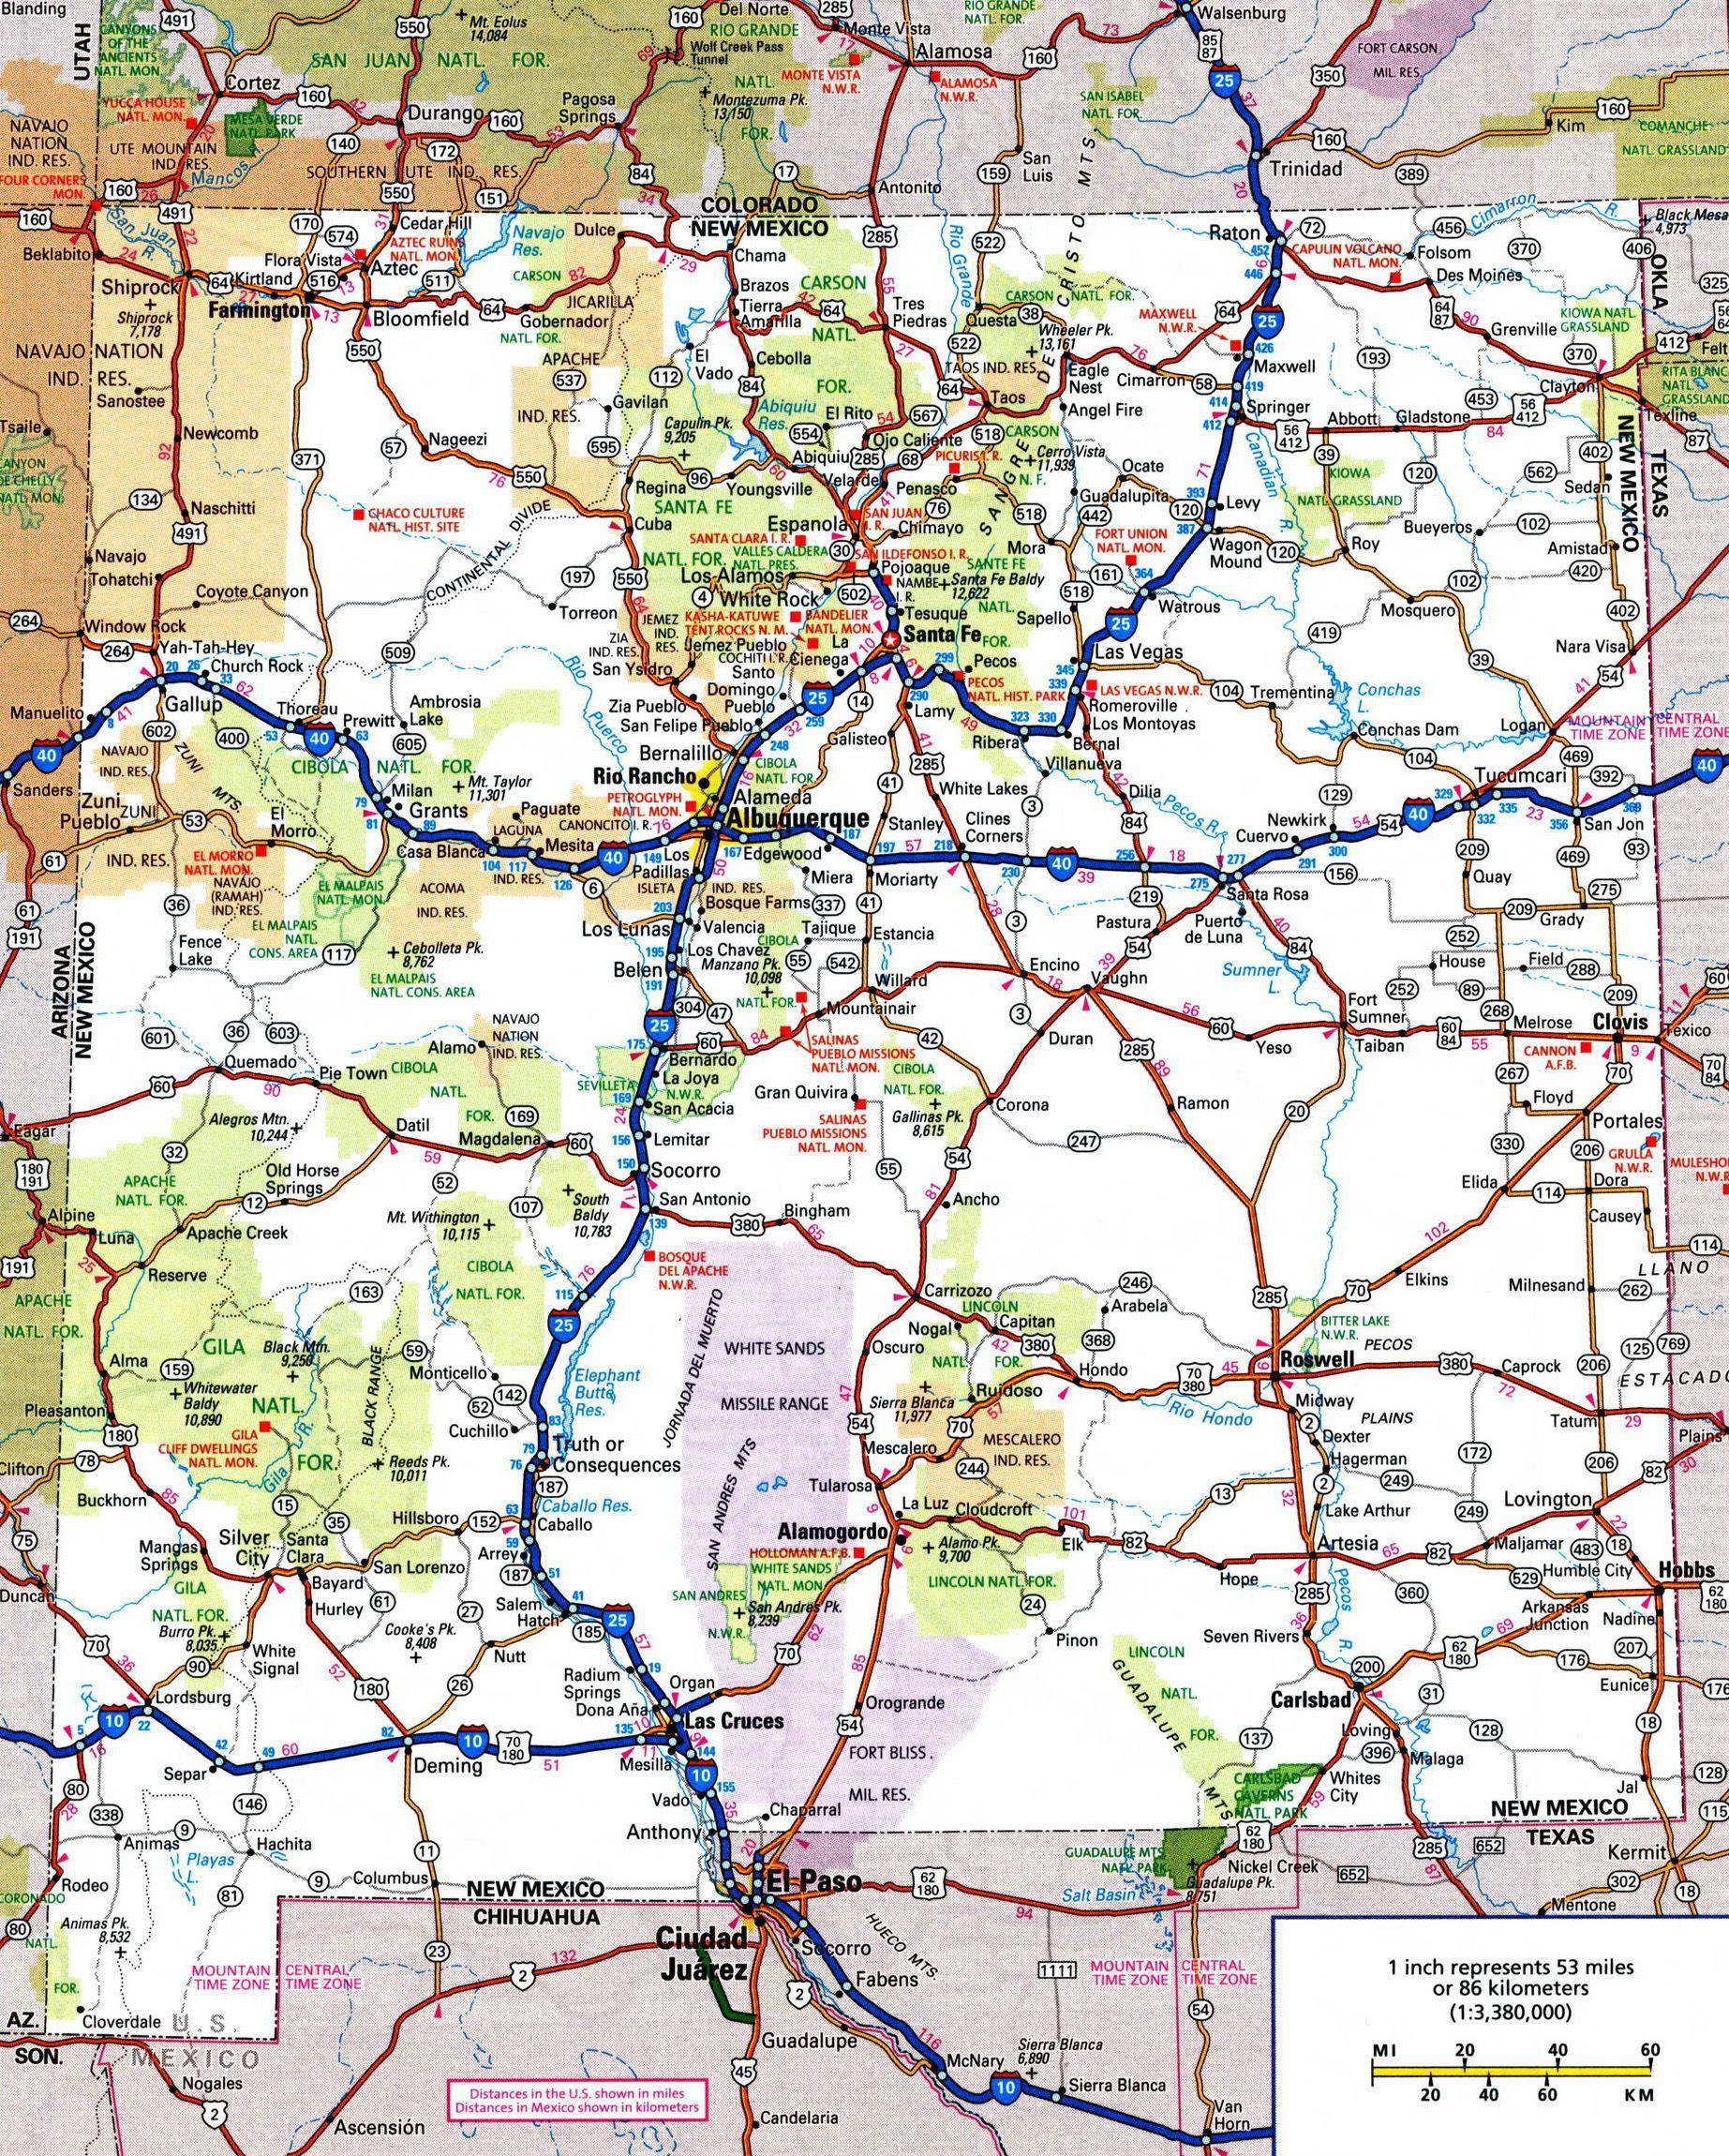 New Mexico Map Google Search TravelUS5 Colo NMexico